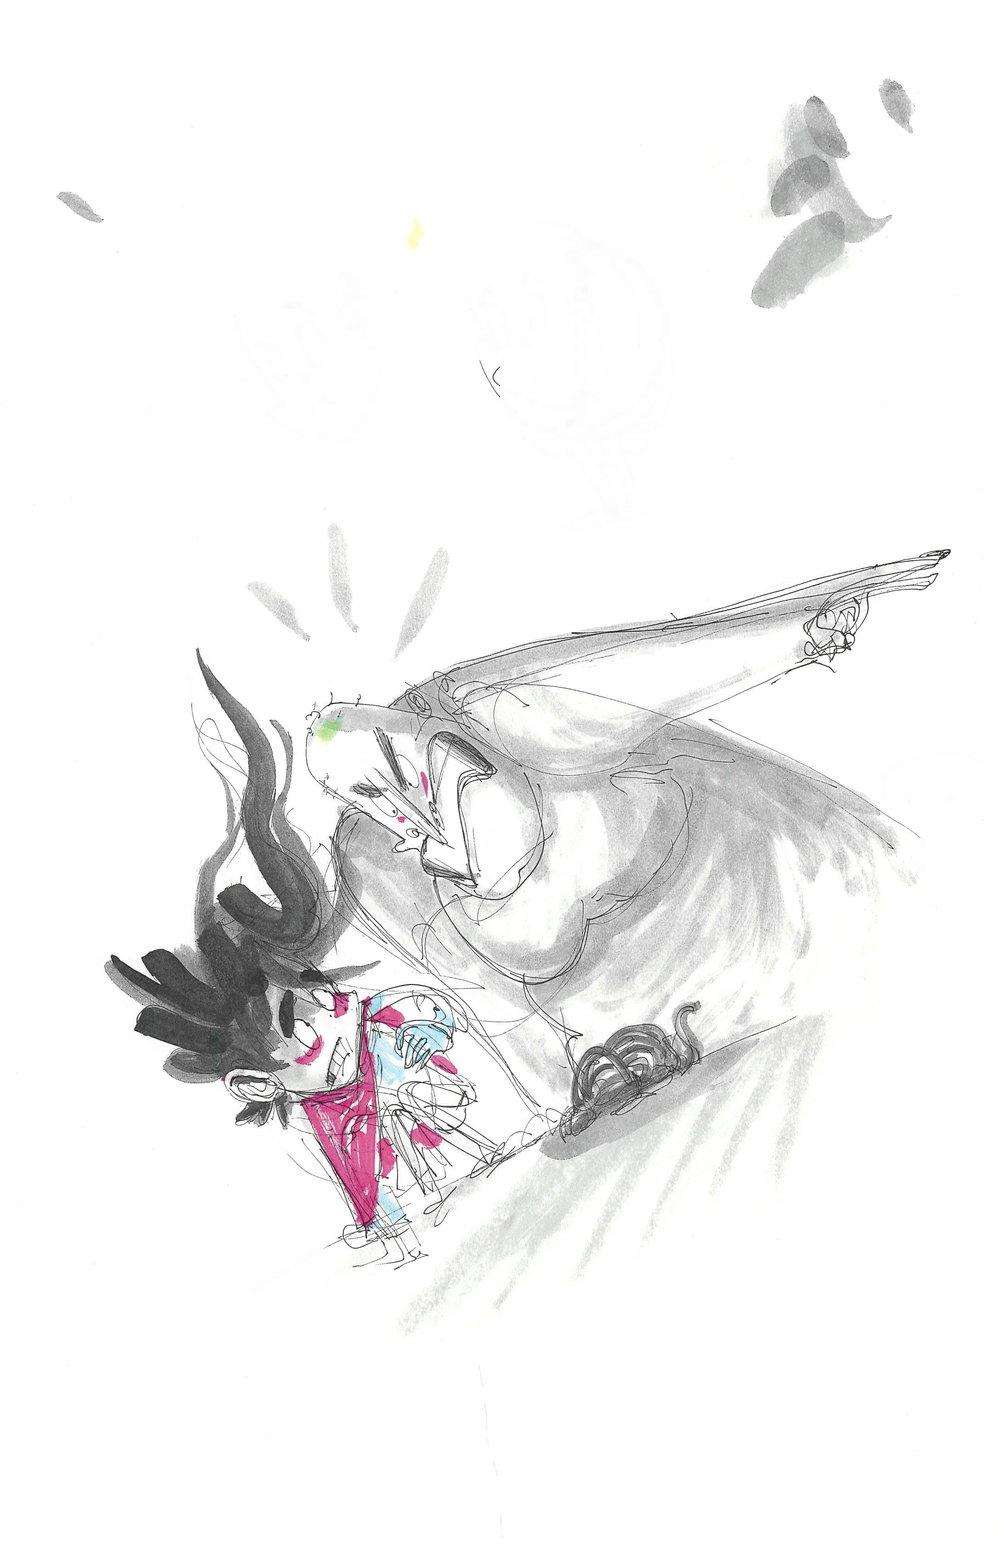 BRIANWONDERS-sketches-1_Page_18_Image_0001.jpg